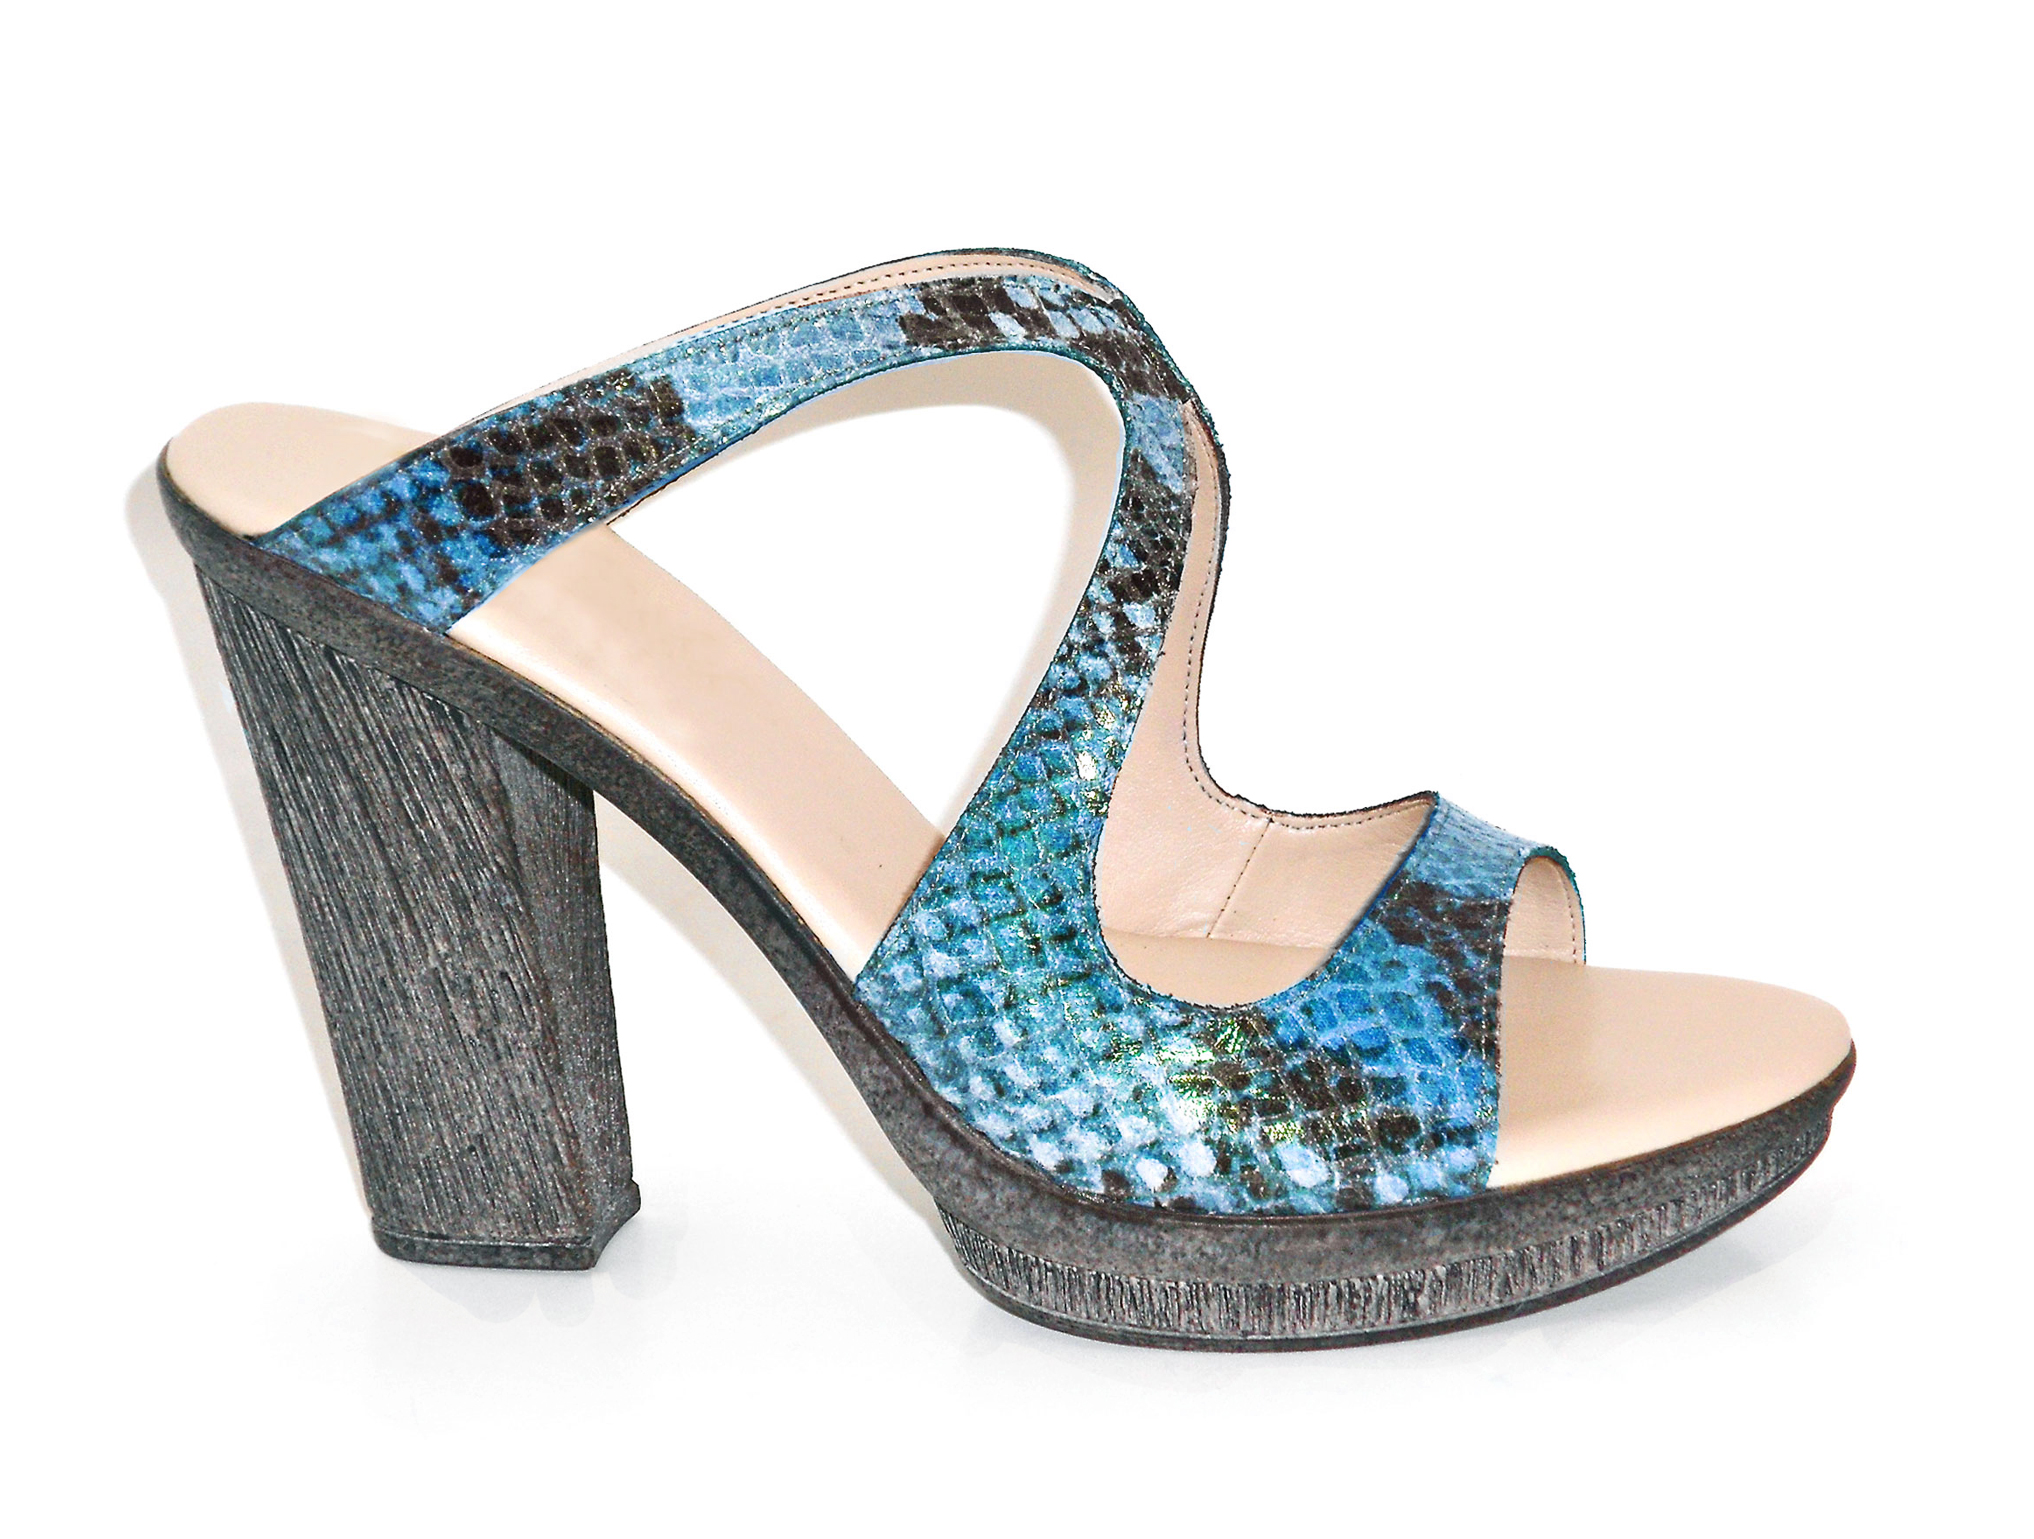 lindsay-star-toomey-designer-footwear-comfort-fashion-reptile-blue-shoes-heels-shoes-comfort-luxury-madeinusa-snakeskin